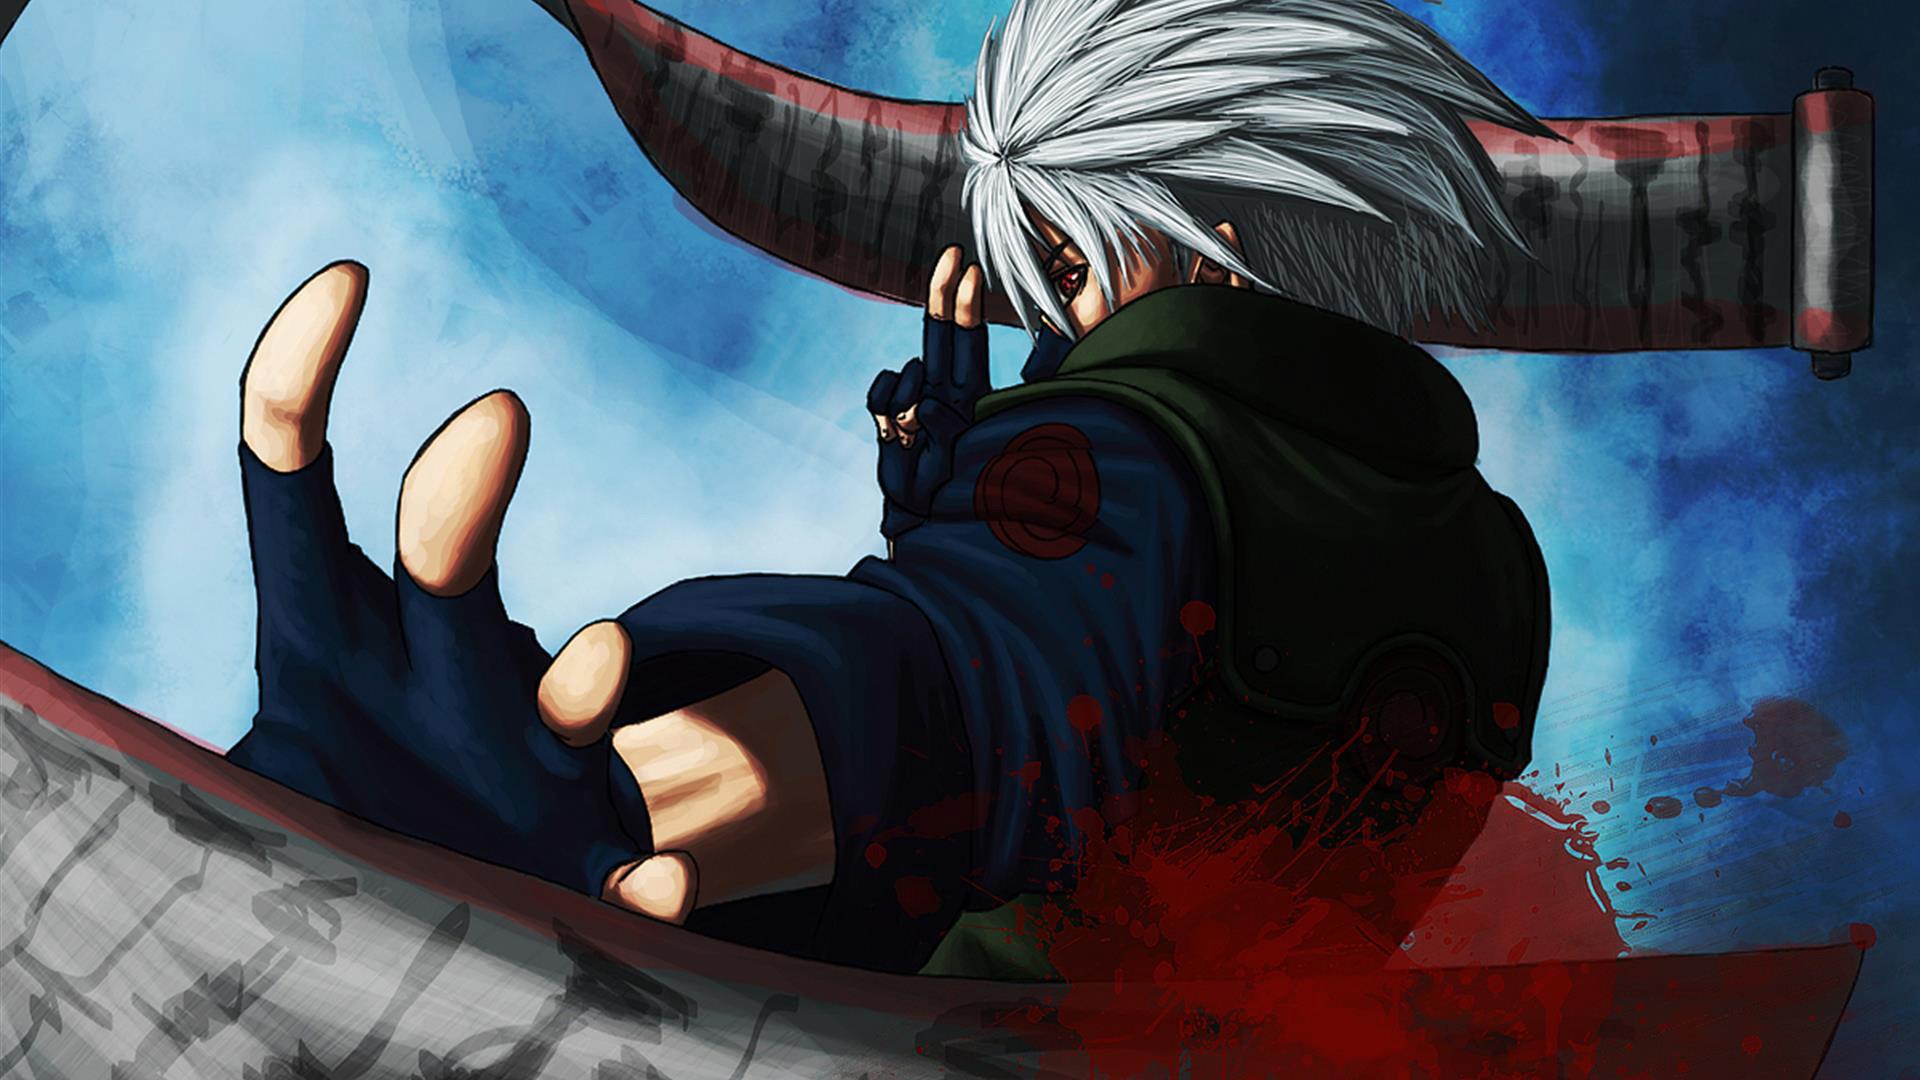 hatake kakashi sharingan eyes scroll summon anime hd